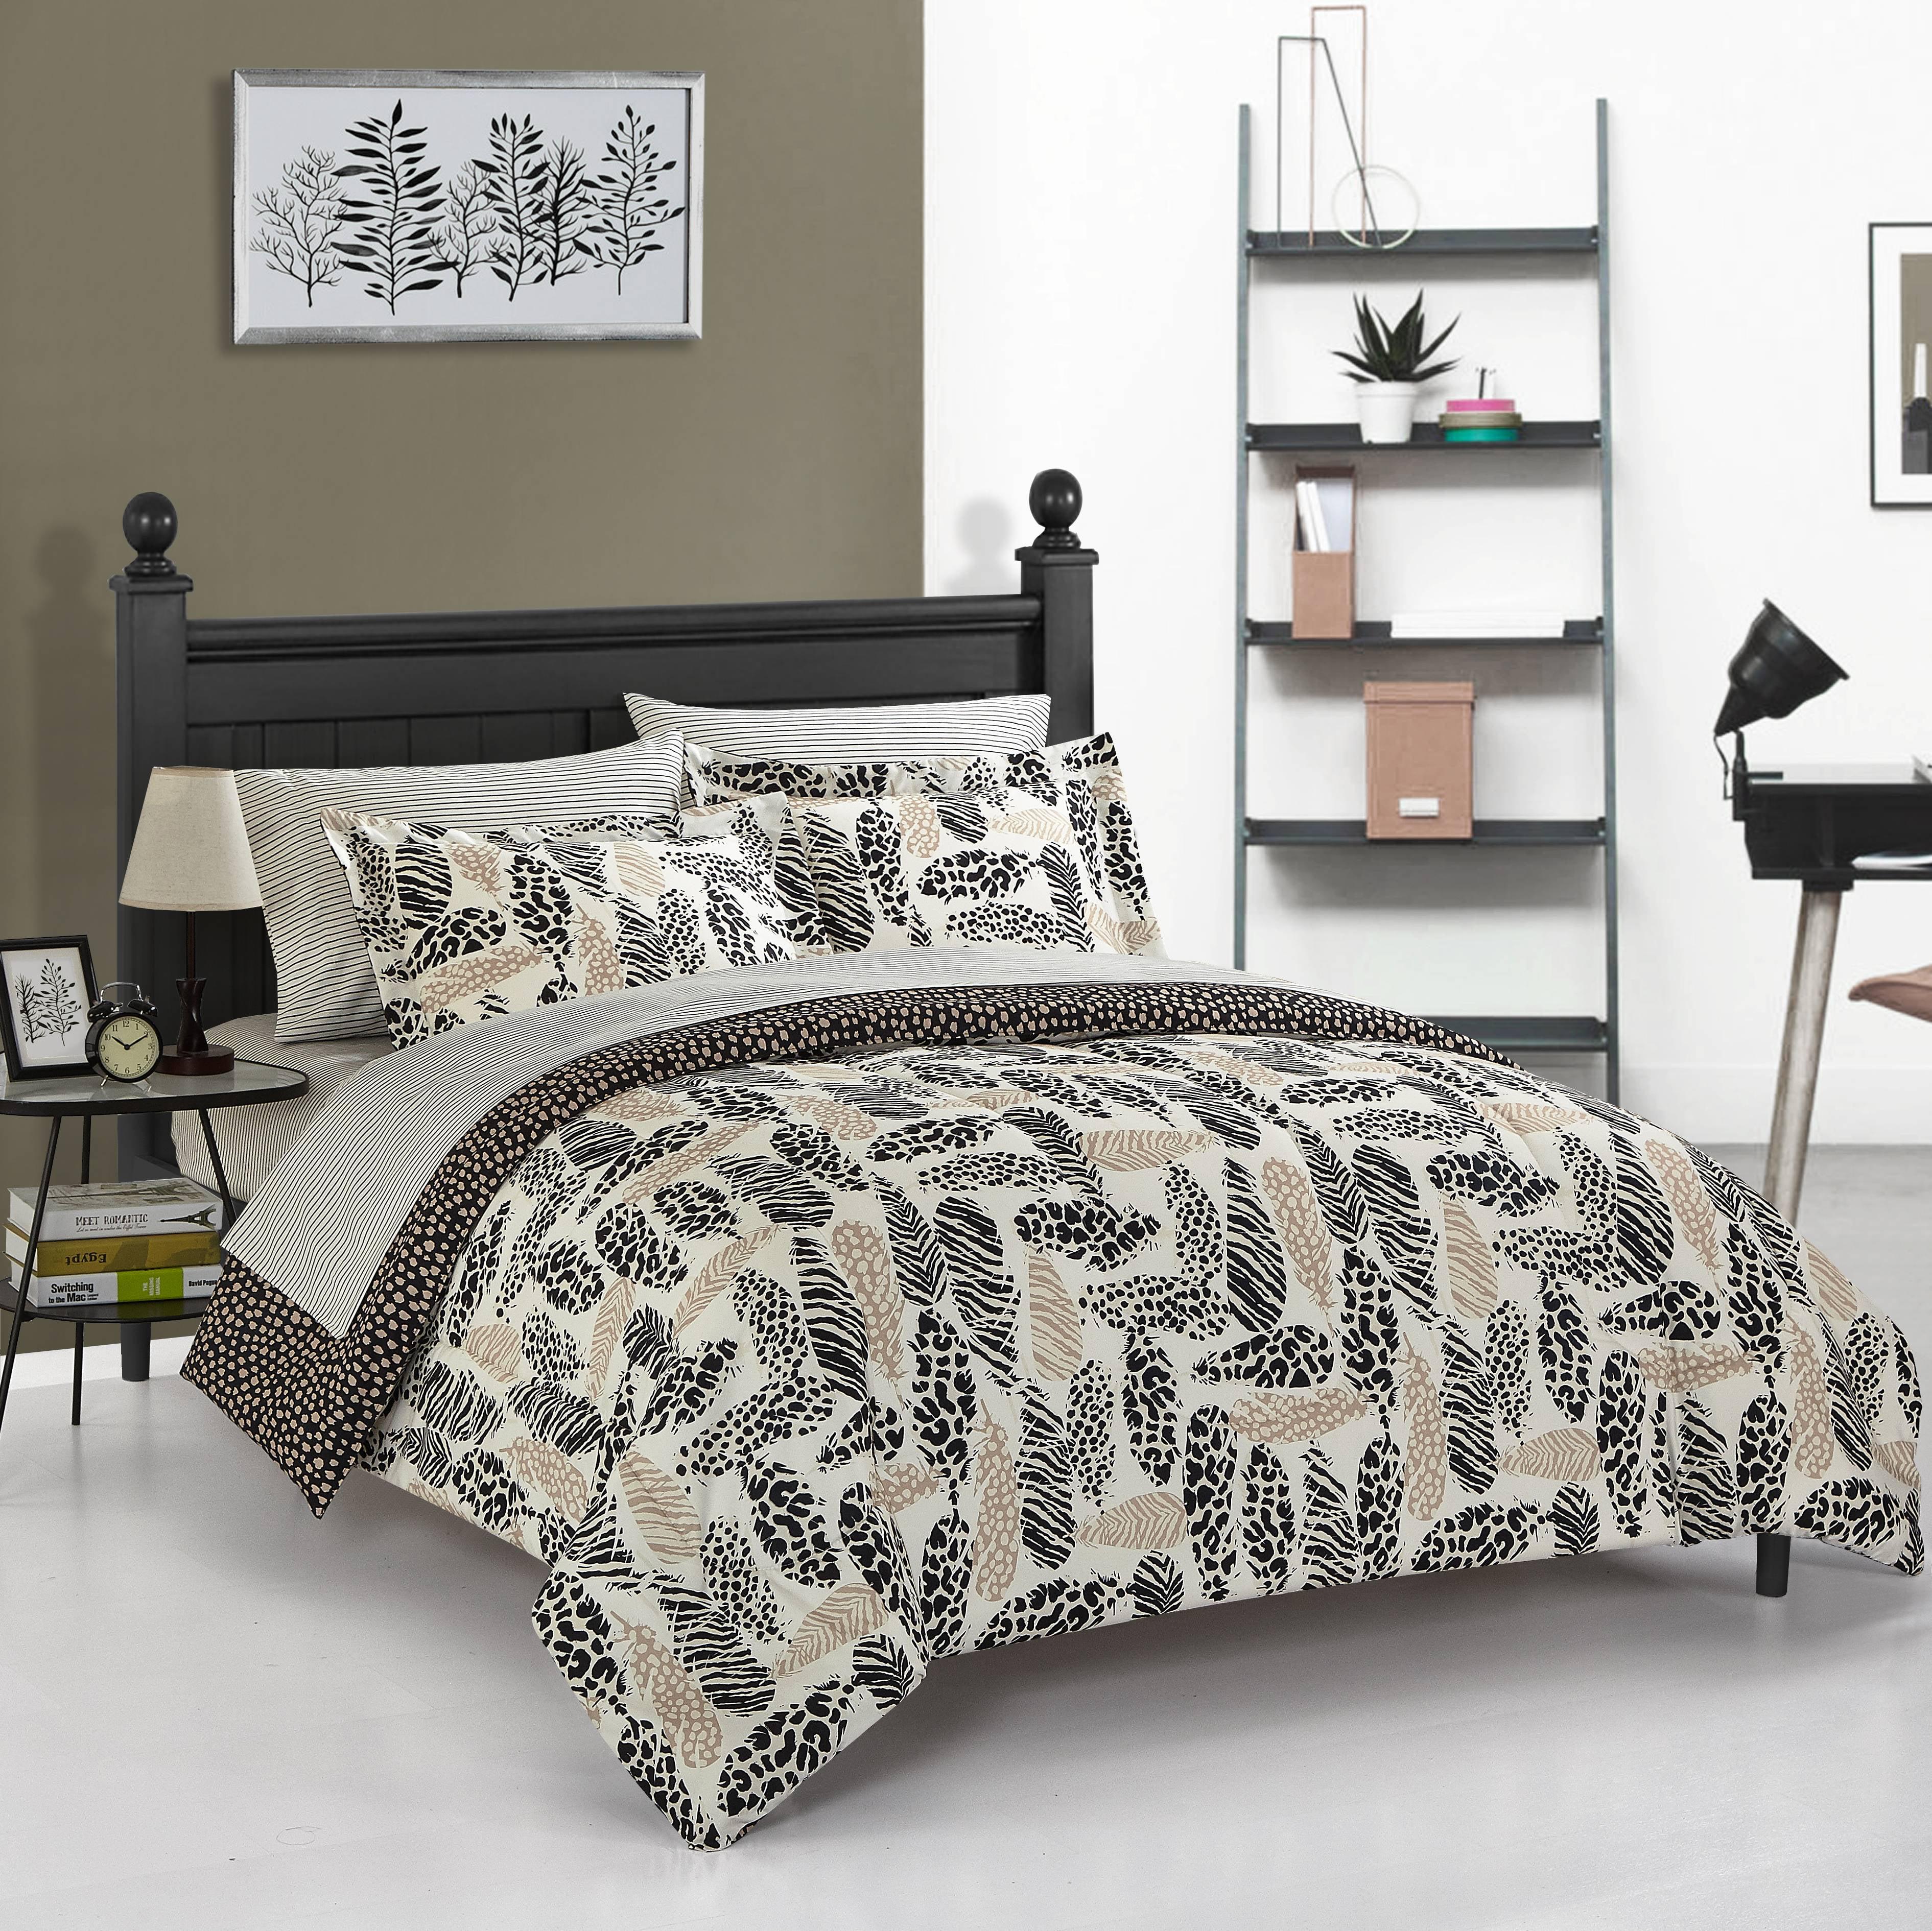 Heritage Club Wild Fauna Metallic Feathers Bed in a Bag